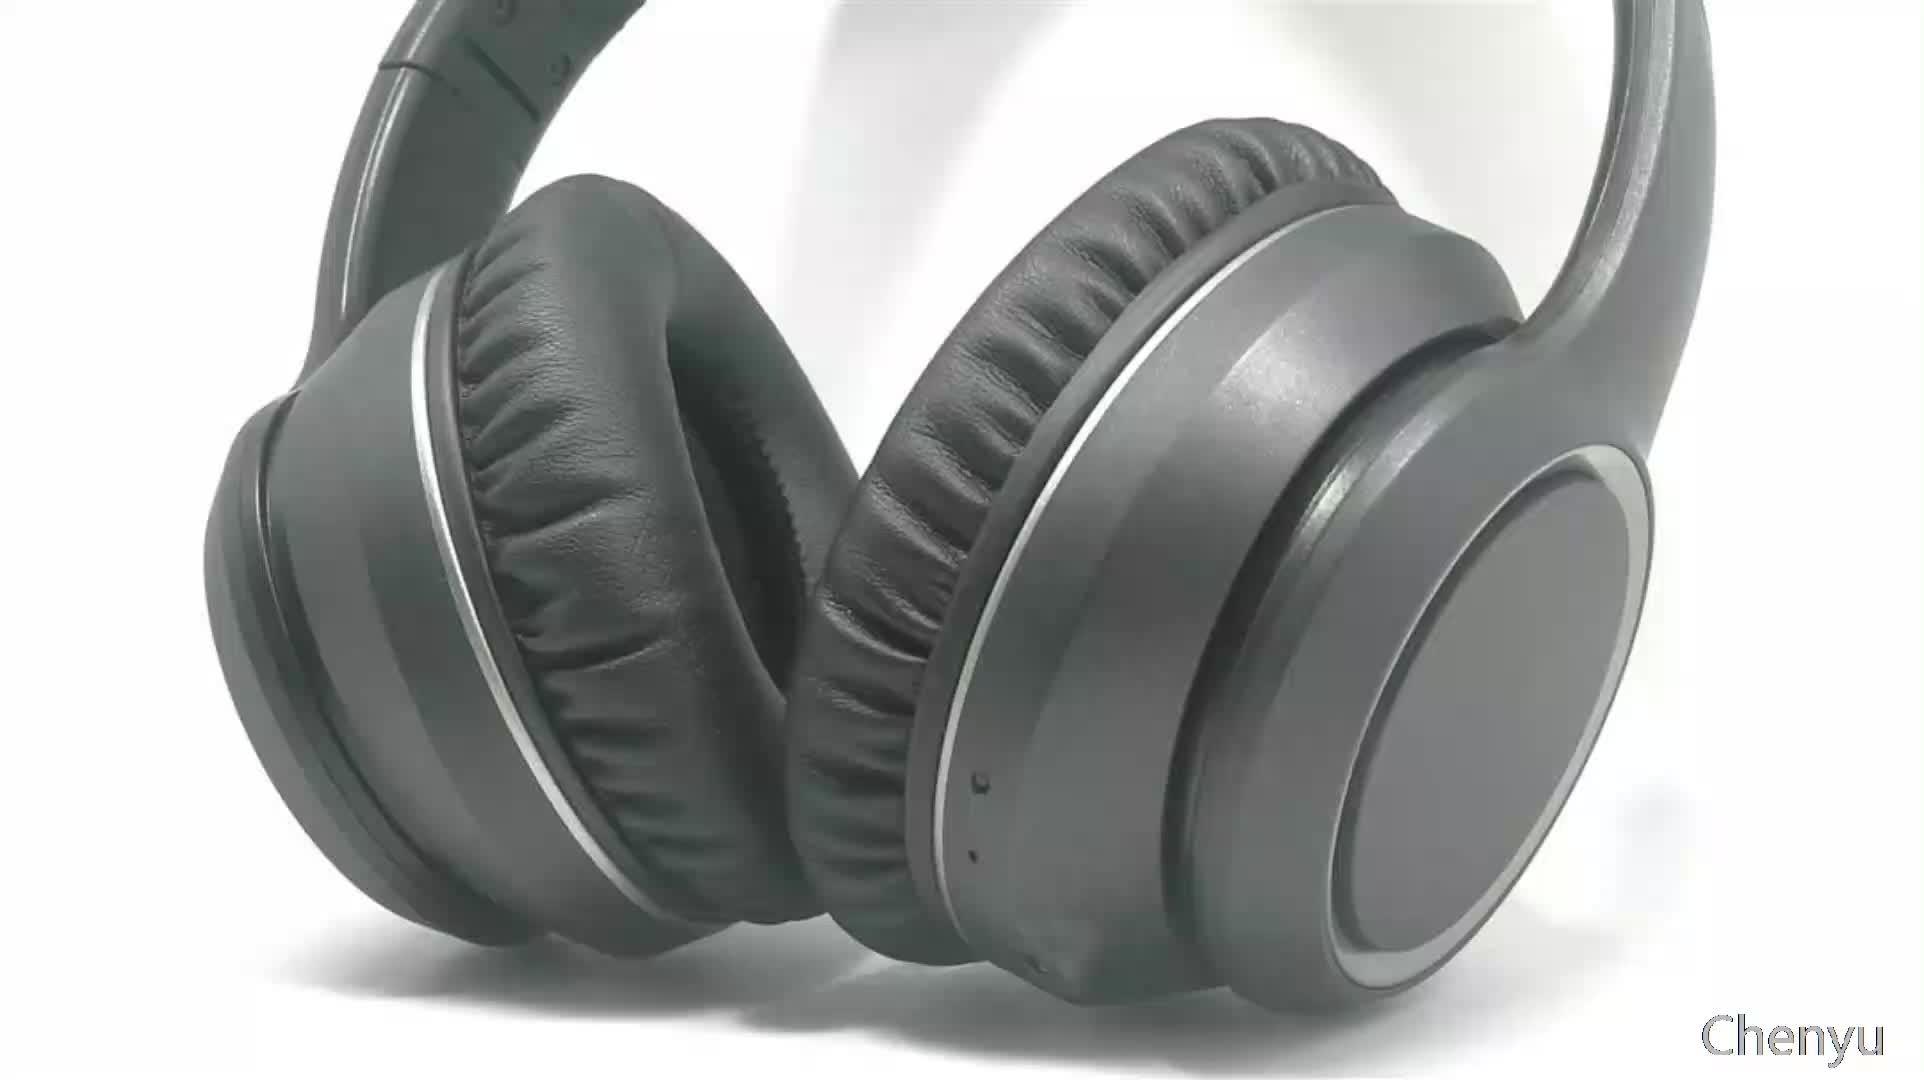 Wholesale OEM active noise cancelling headphone foldable headband true stereo blue tooth anc tws headphone